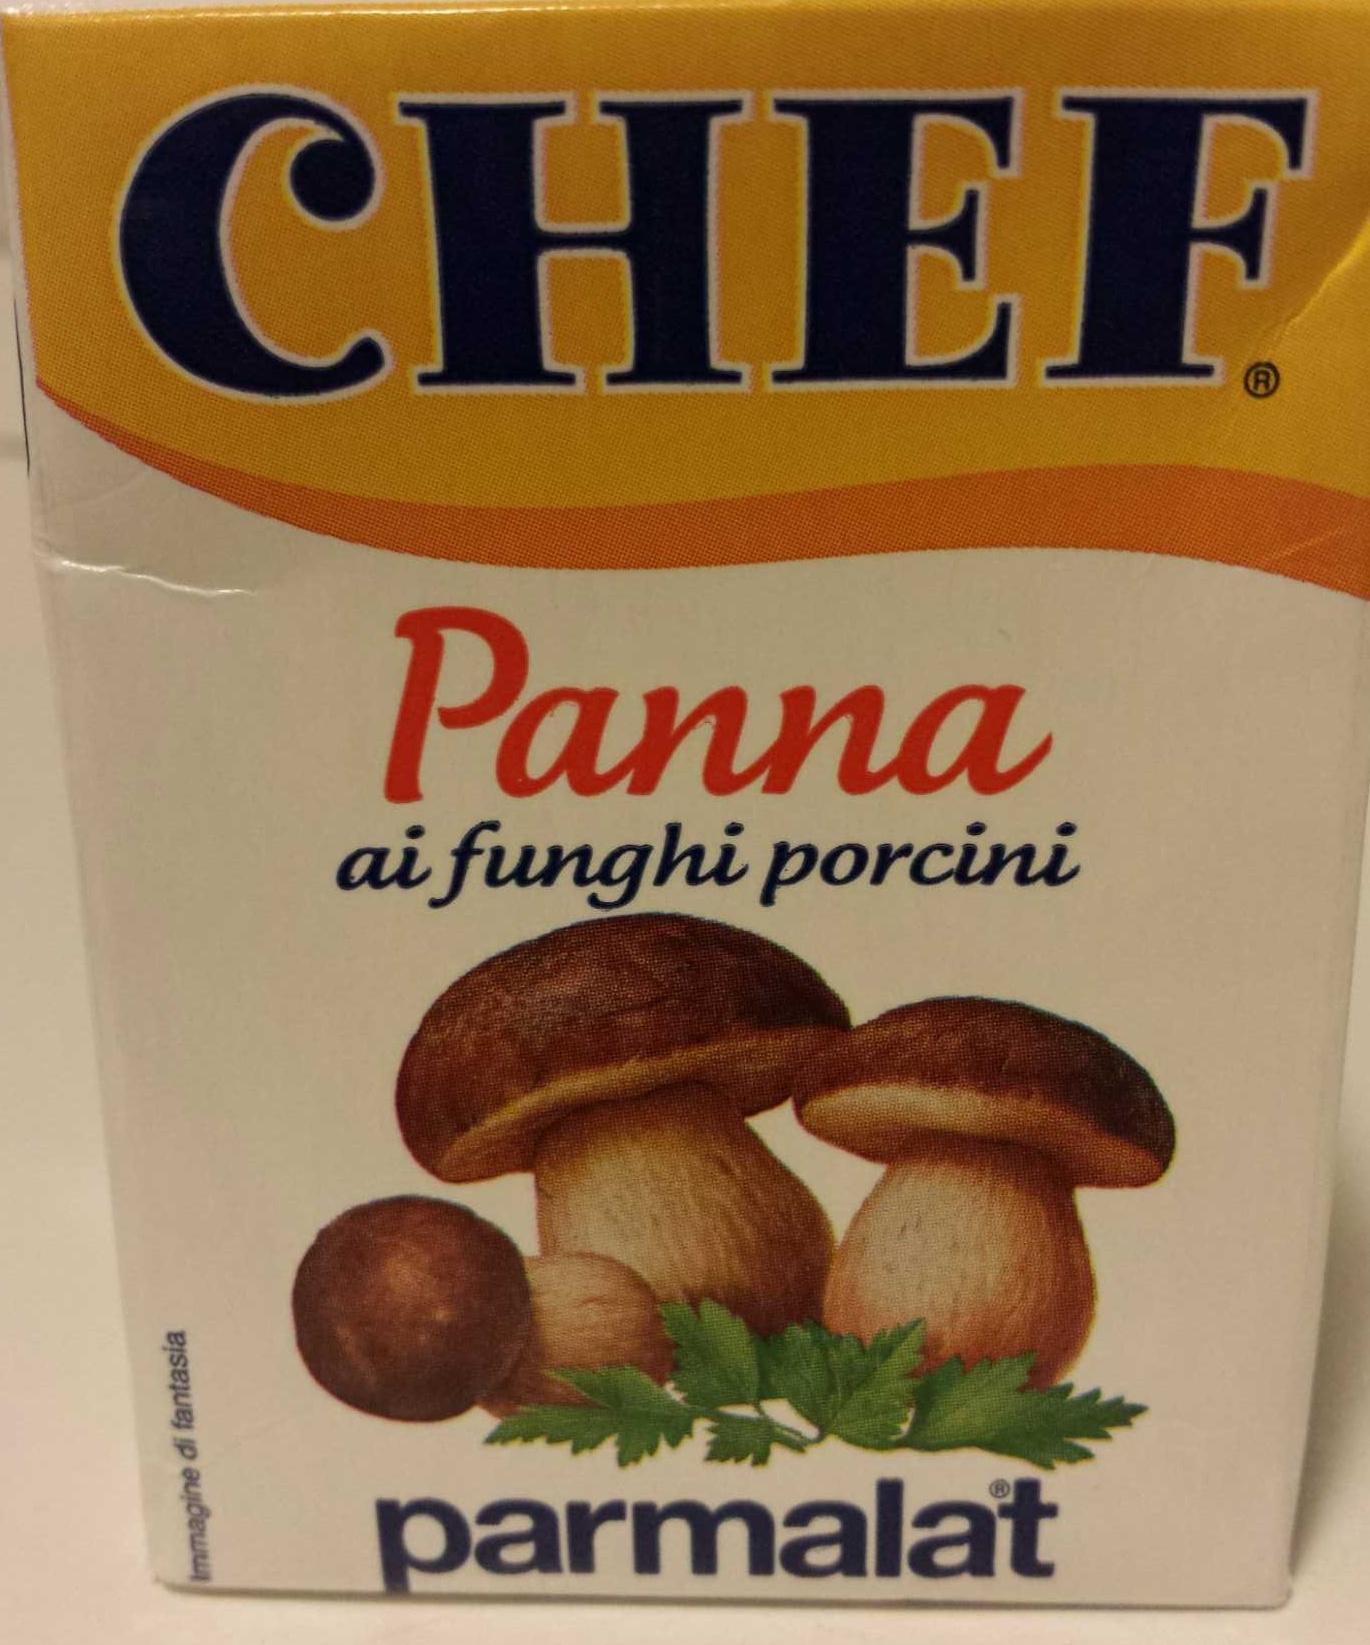 PARMALAT Panna ai funghi porcini Chef - Product - it